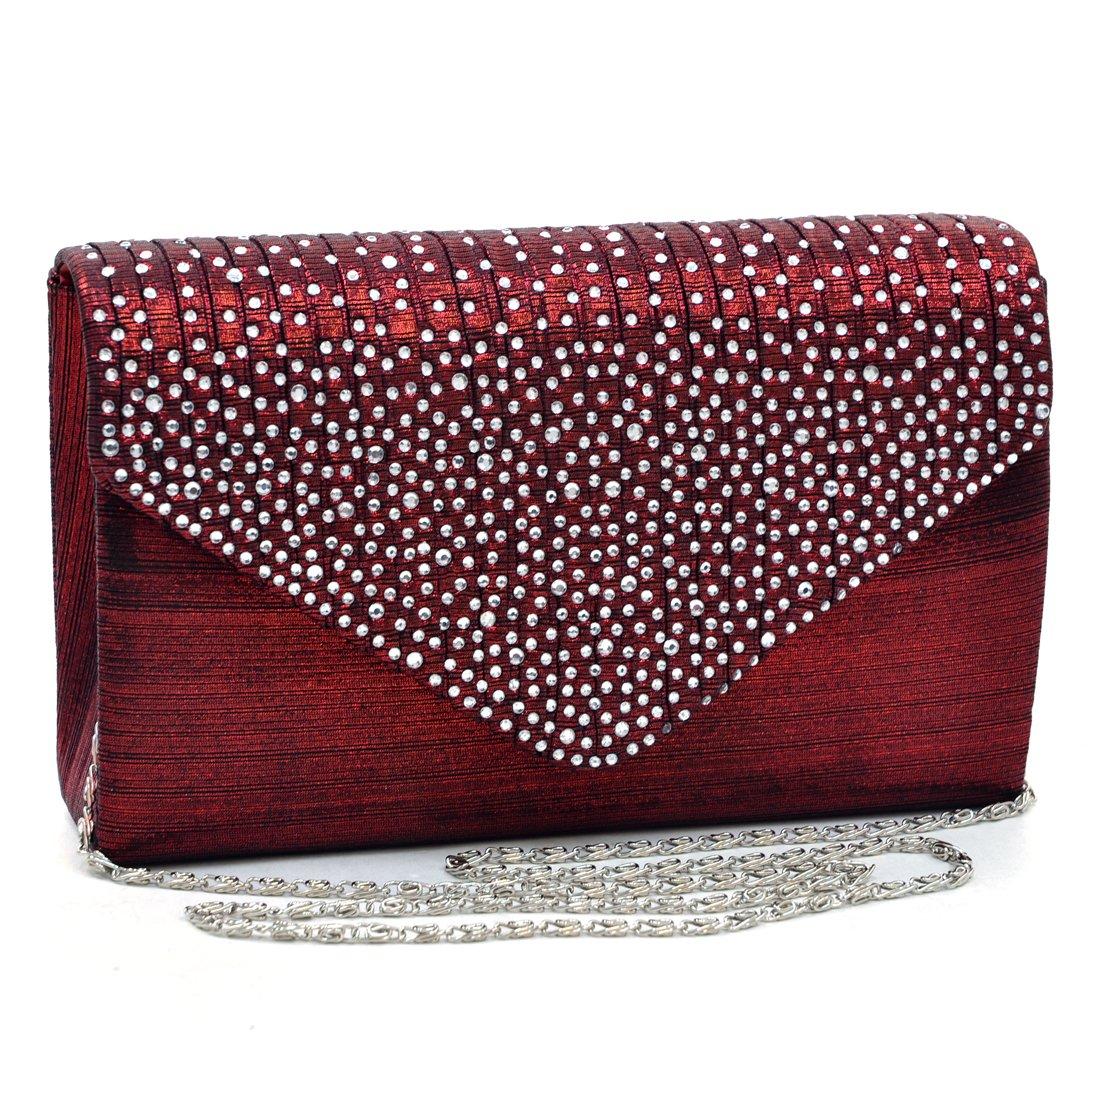 Womens Envelope Flap Clutch Handbag Evening Bag Purse Rhinestone Crystal Glitter Sequin Party Red